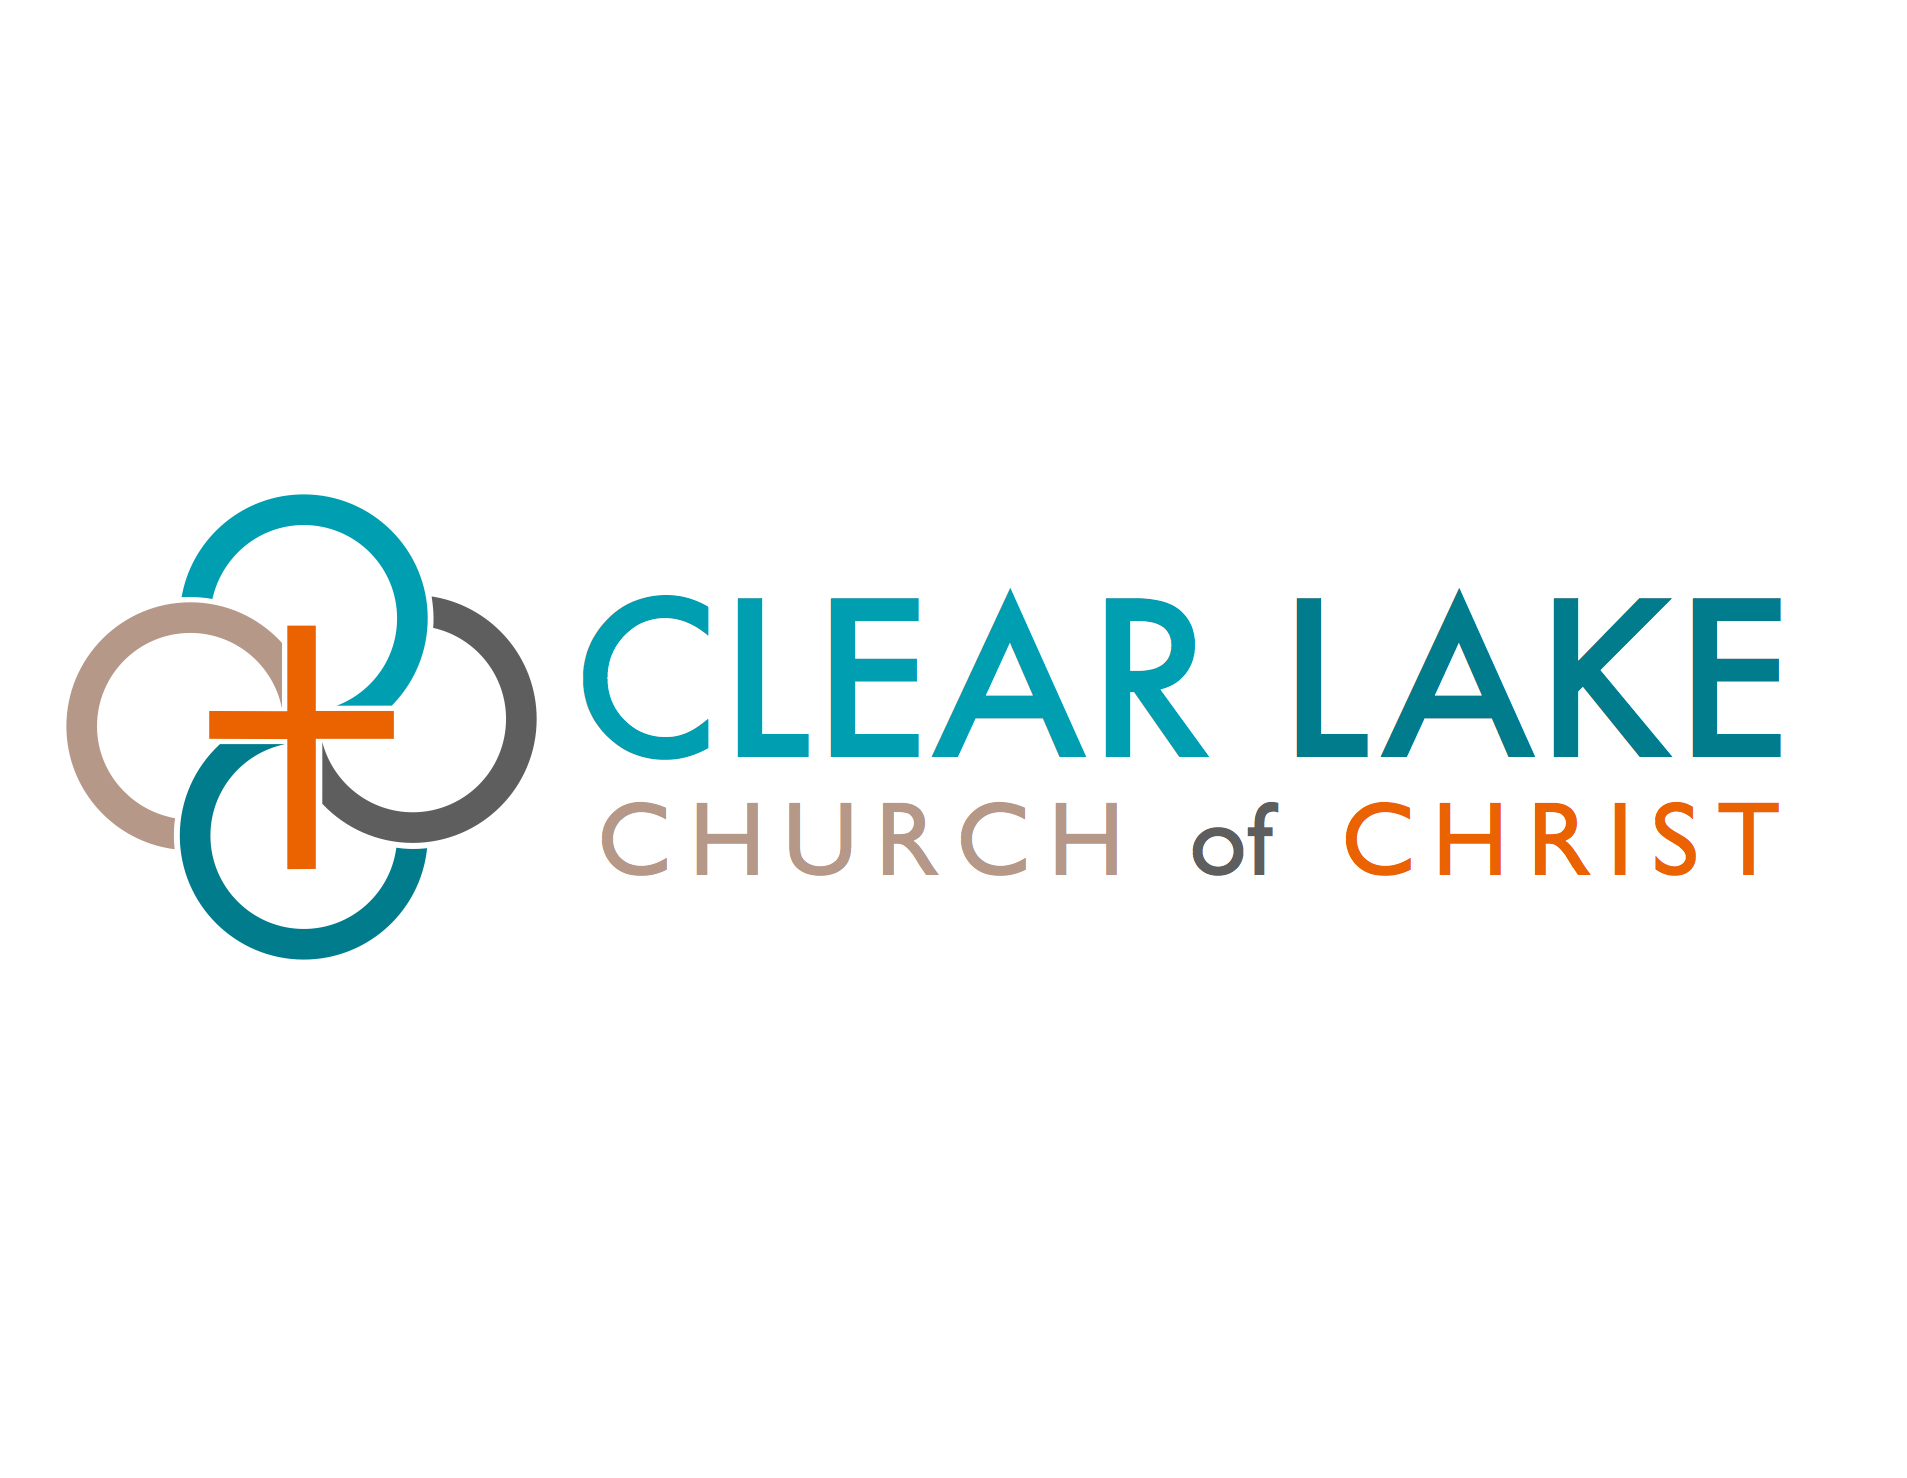 clcc-logo-multi-wh-bkg-1